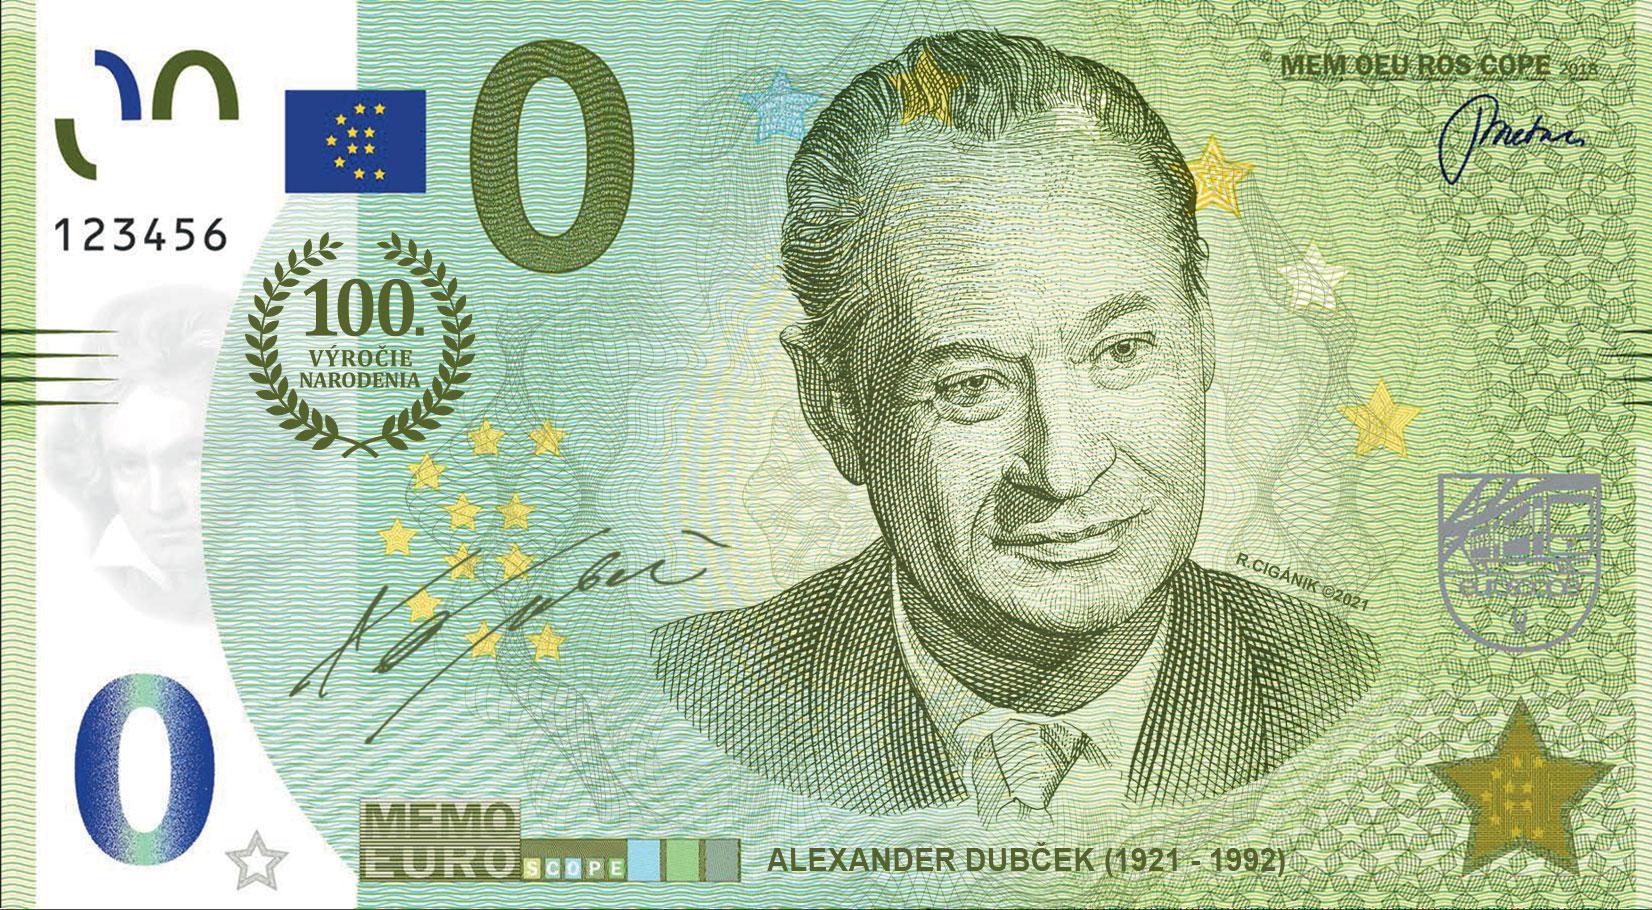 133_15_Alexander_Dubcek-front